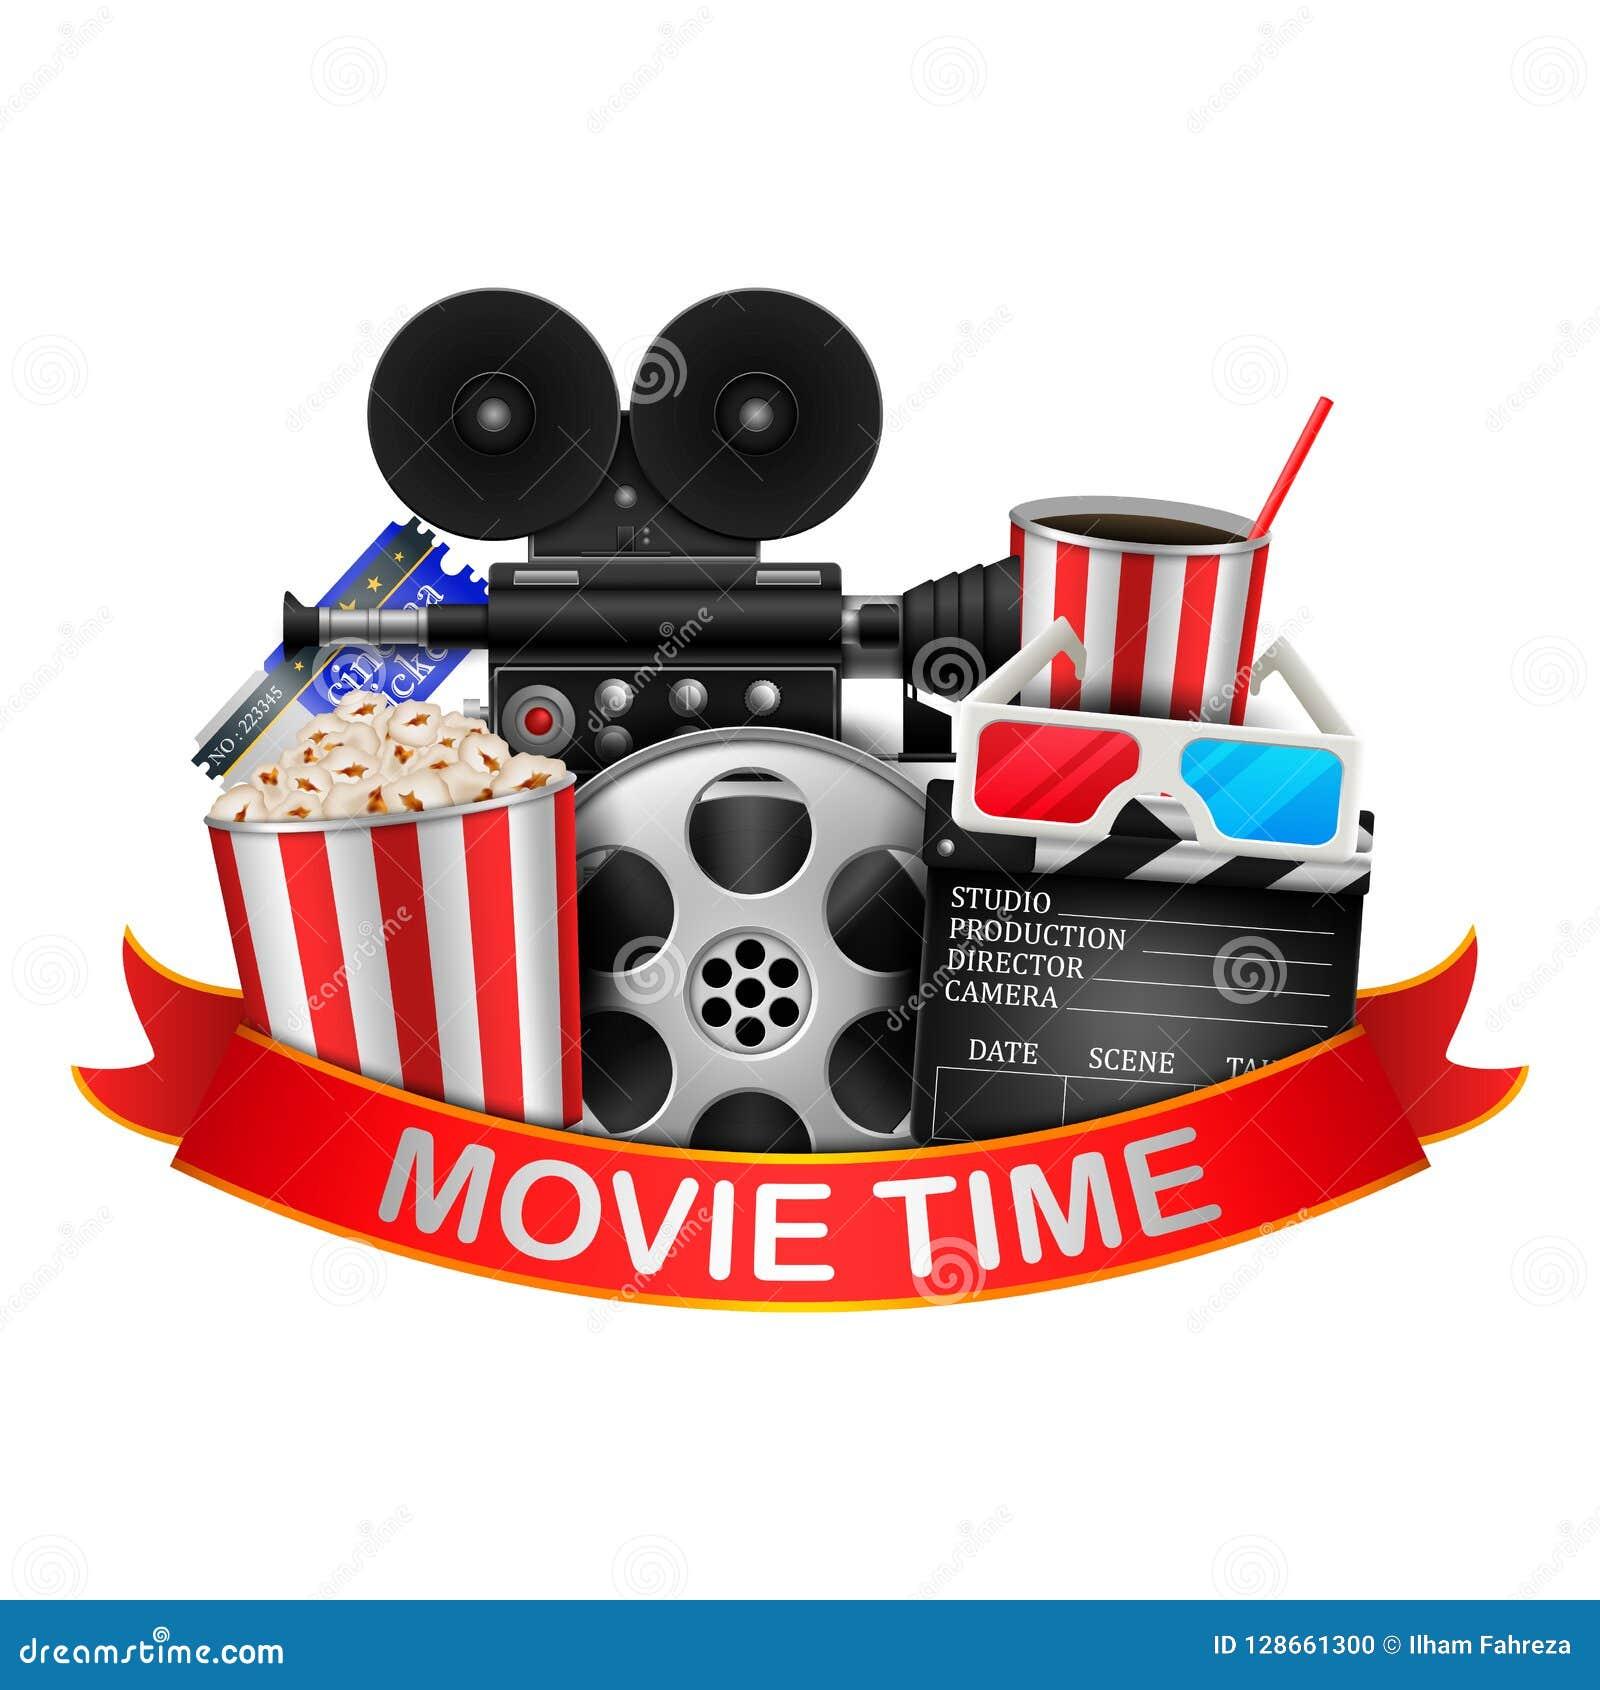 Movie time essays